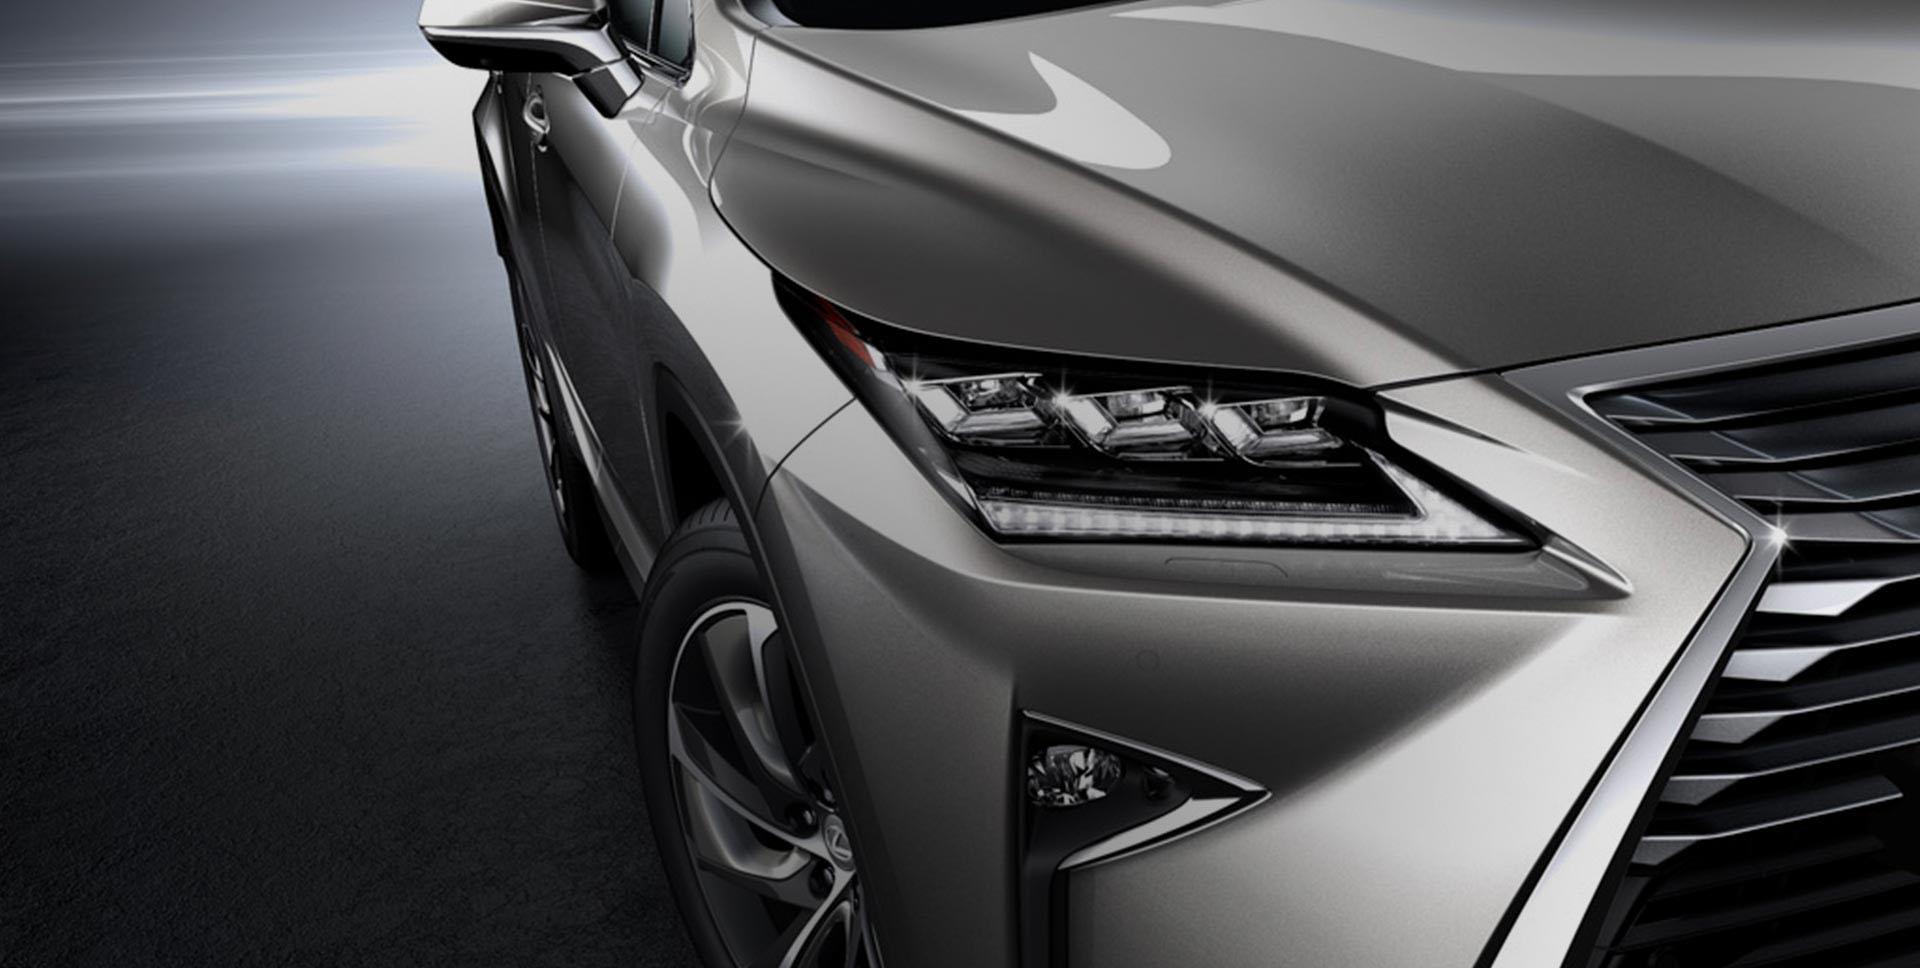 Detailfoto van grille grijze Lexus RX